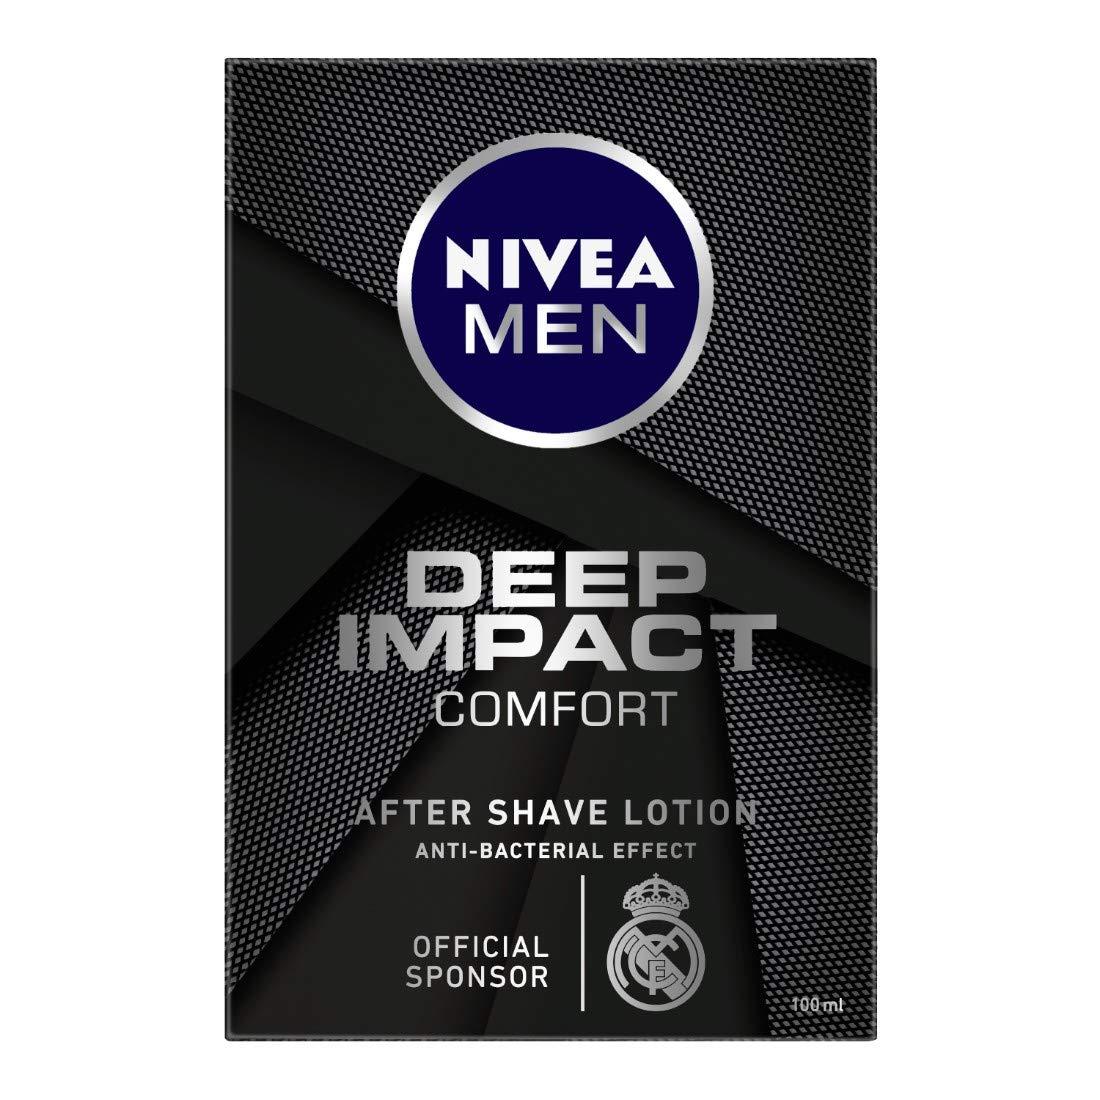 NIVEA Men Shaving, Deep Impact Comfort After Shave Lotion, Anti Bacterial Effect, 100 ml